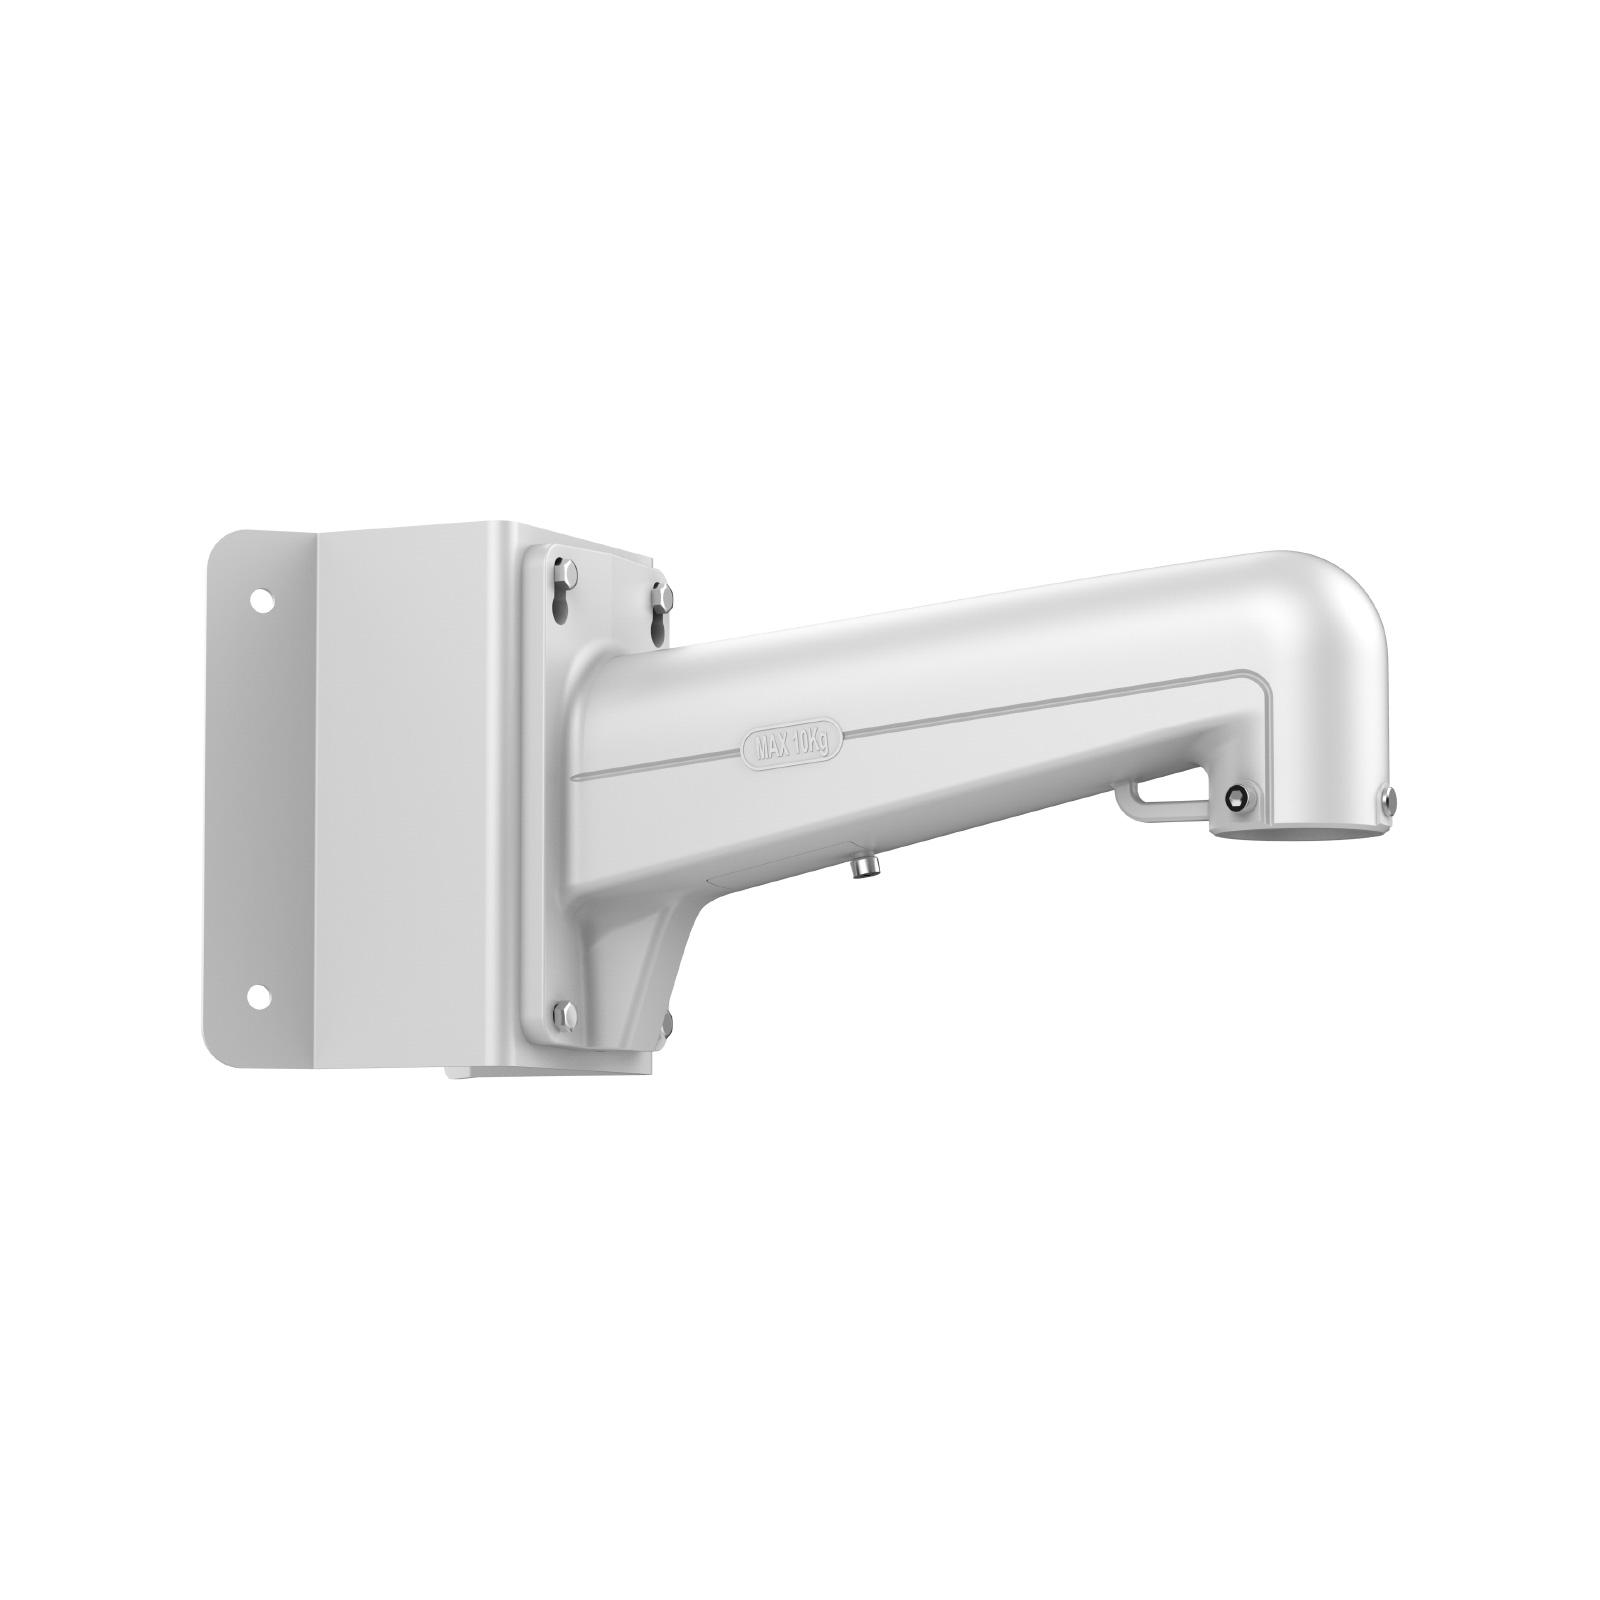 Hikvision-DS-1602ZJ-CORNER-Hikvision-DS-1602ZJ-CORNER-DS-1602ZJ-CORNER-Video Surveillance | Laptop Mechanic